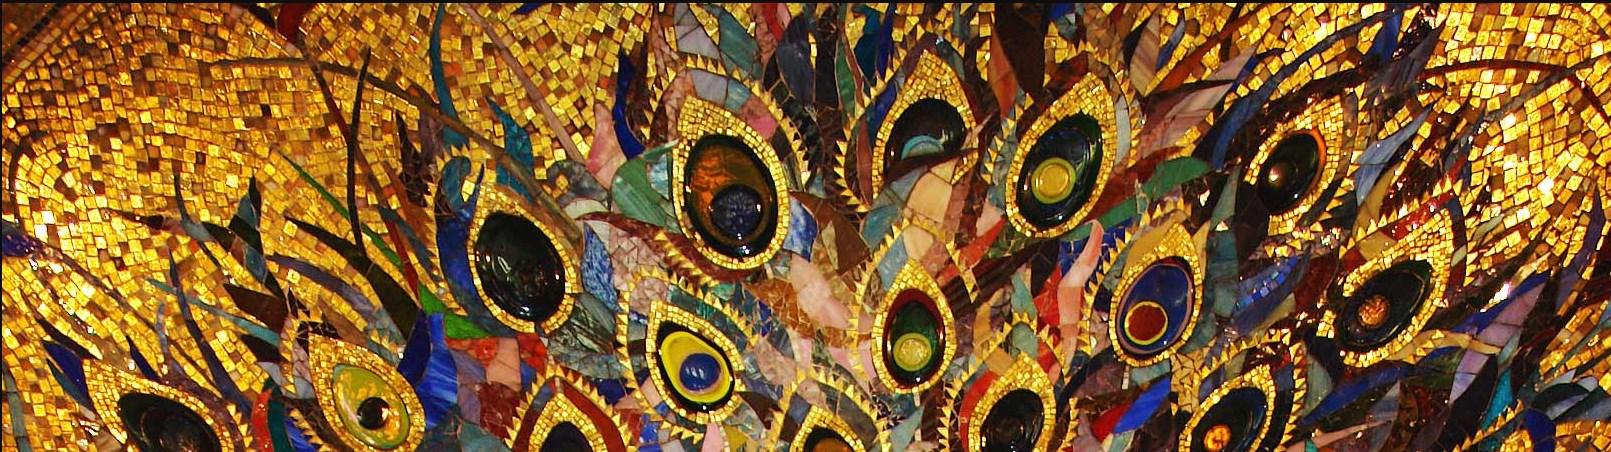 Плитка Мозаика в Москве